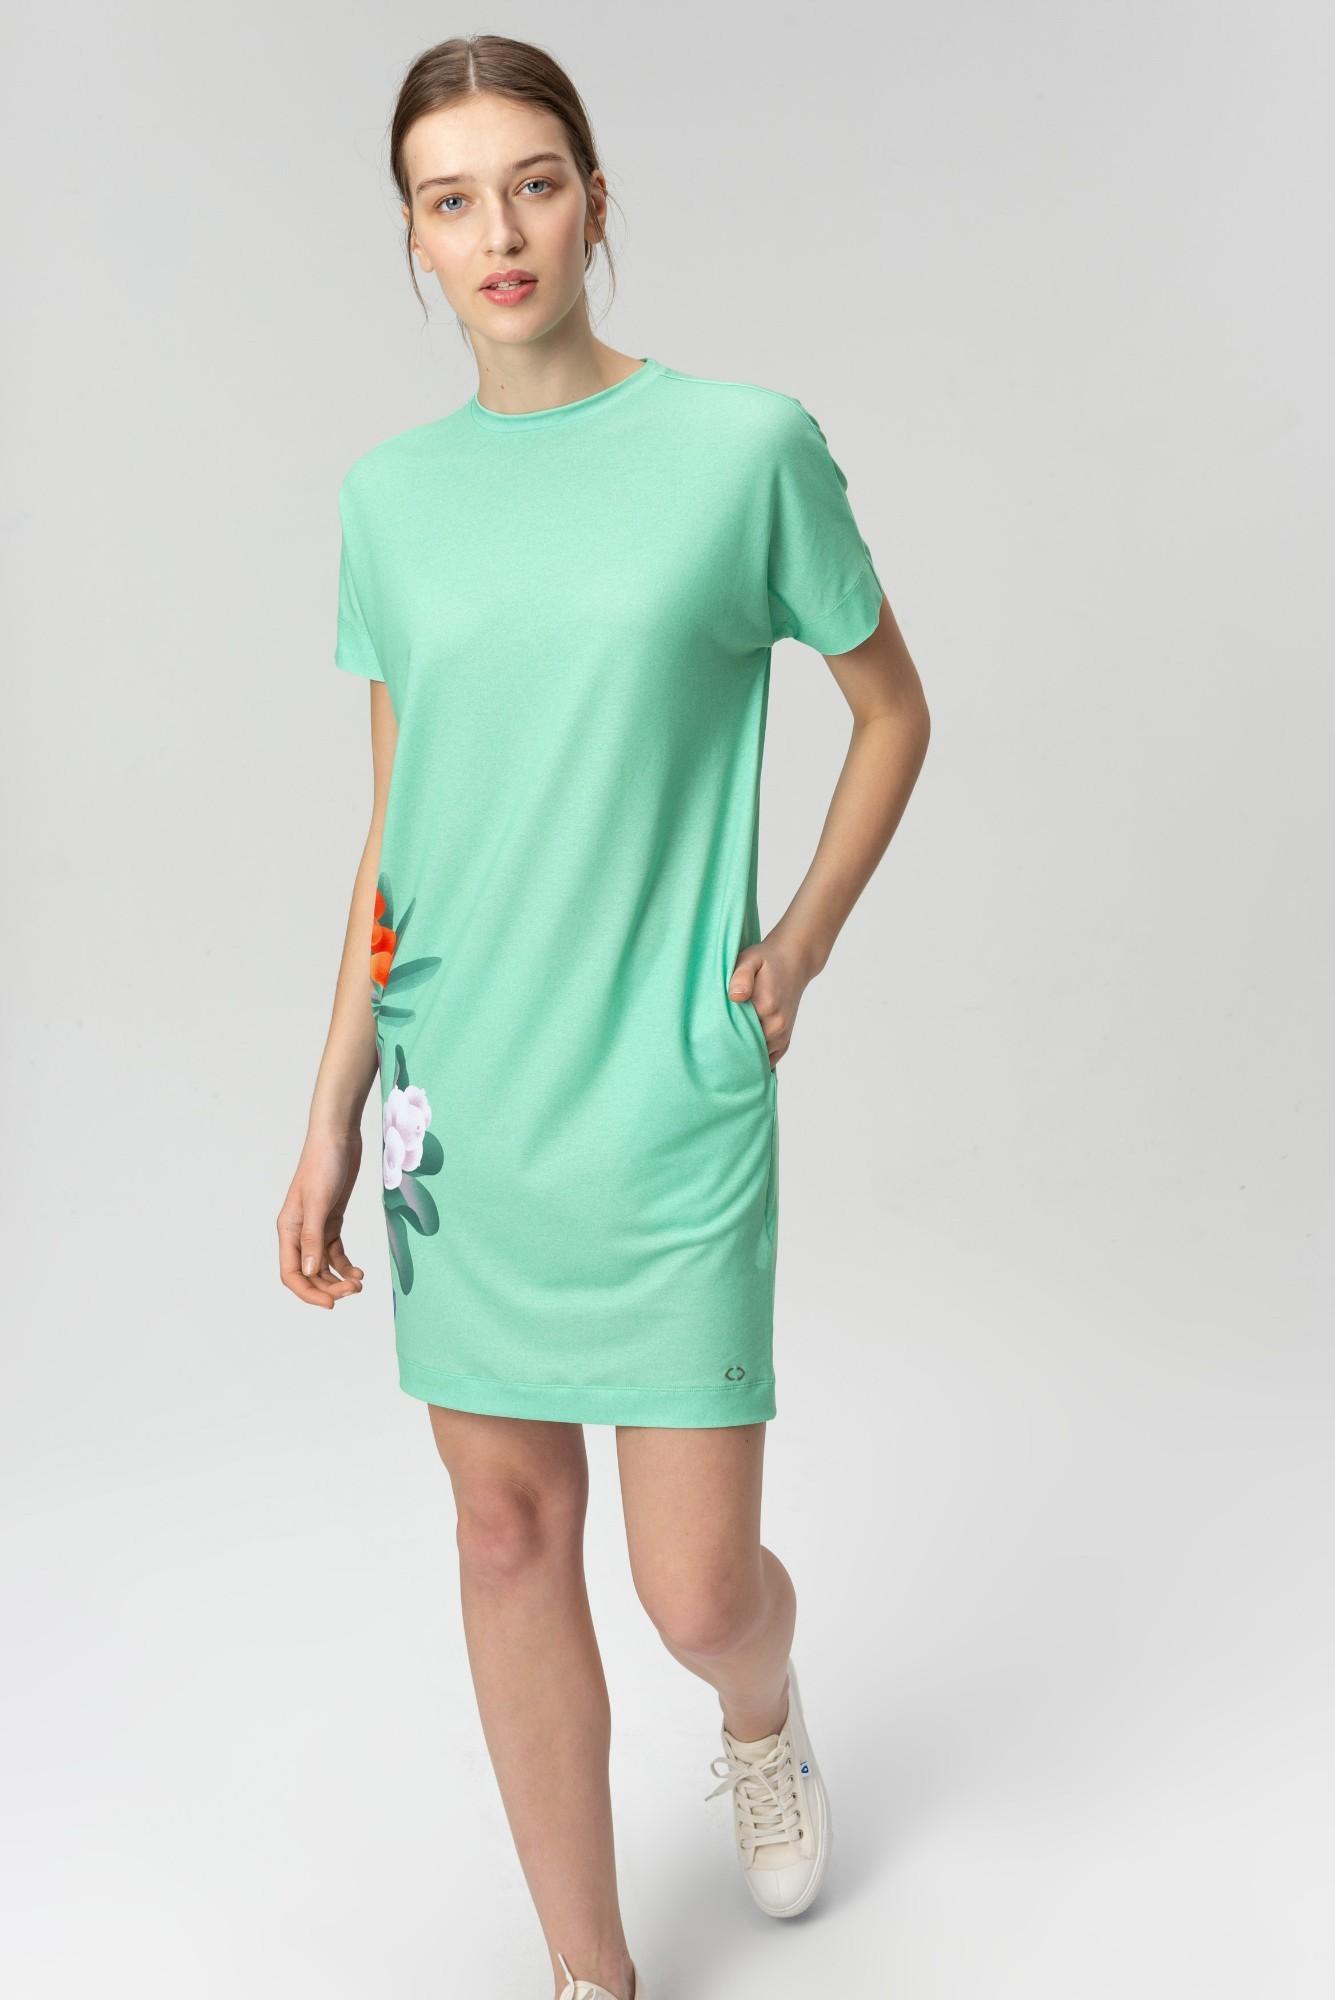 AUDIMAS Trumpa tampri marginta suknelė 20FL-012 Mint Garden L